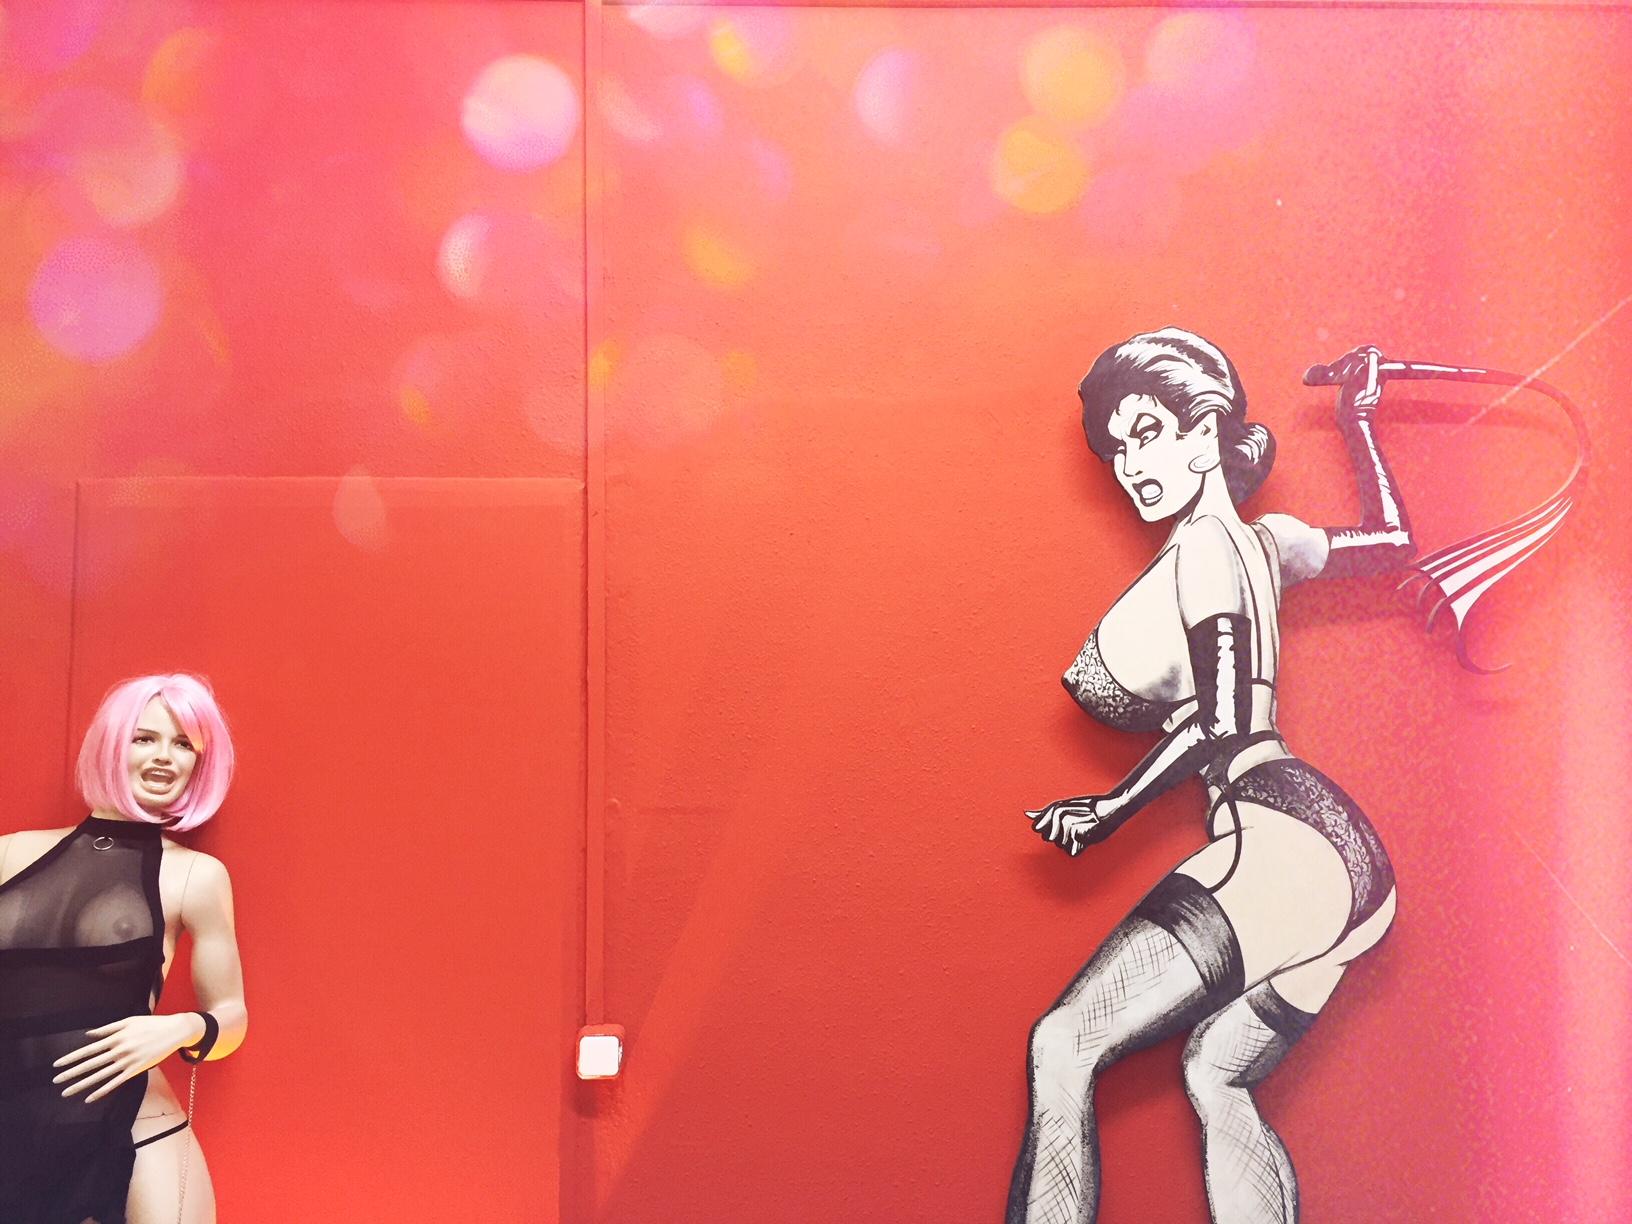 Museu de l'Erotica Barcelona Erotic Museum